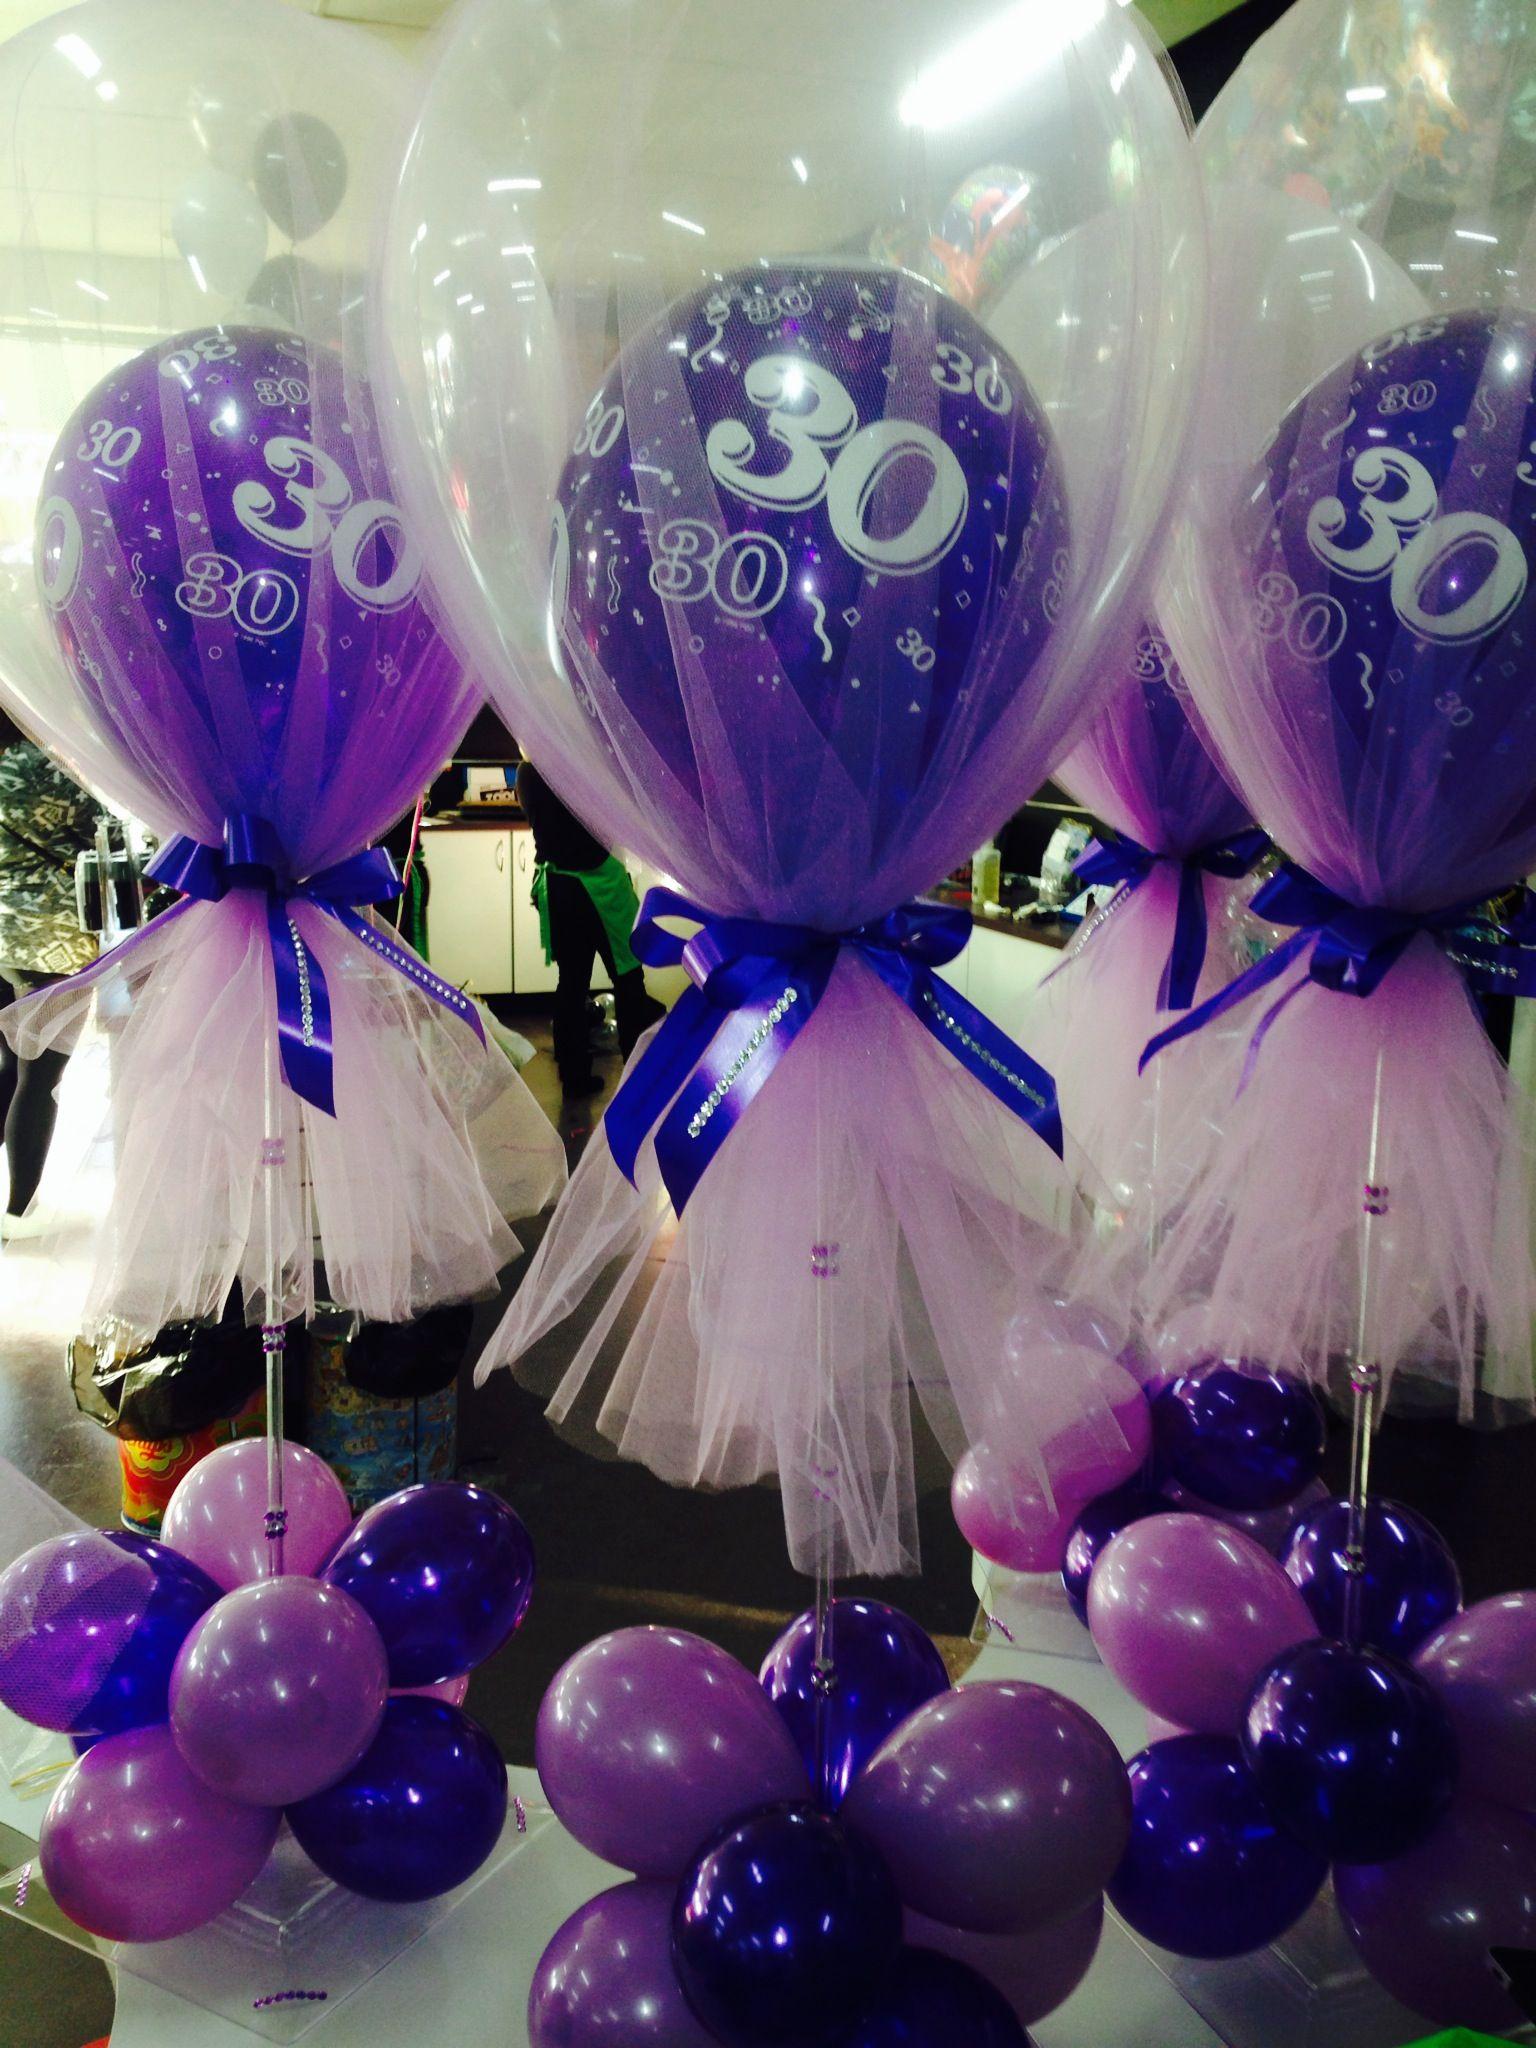 Tulle 30th birthday table centre partyshop shepparton for Balloon arrangement ideas